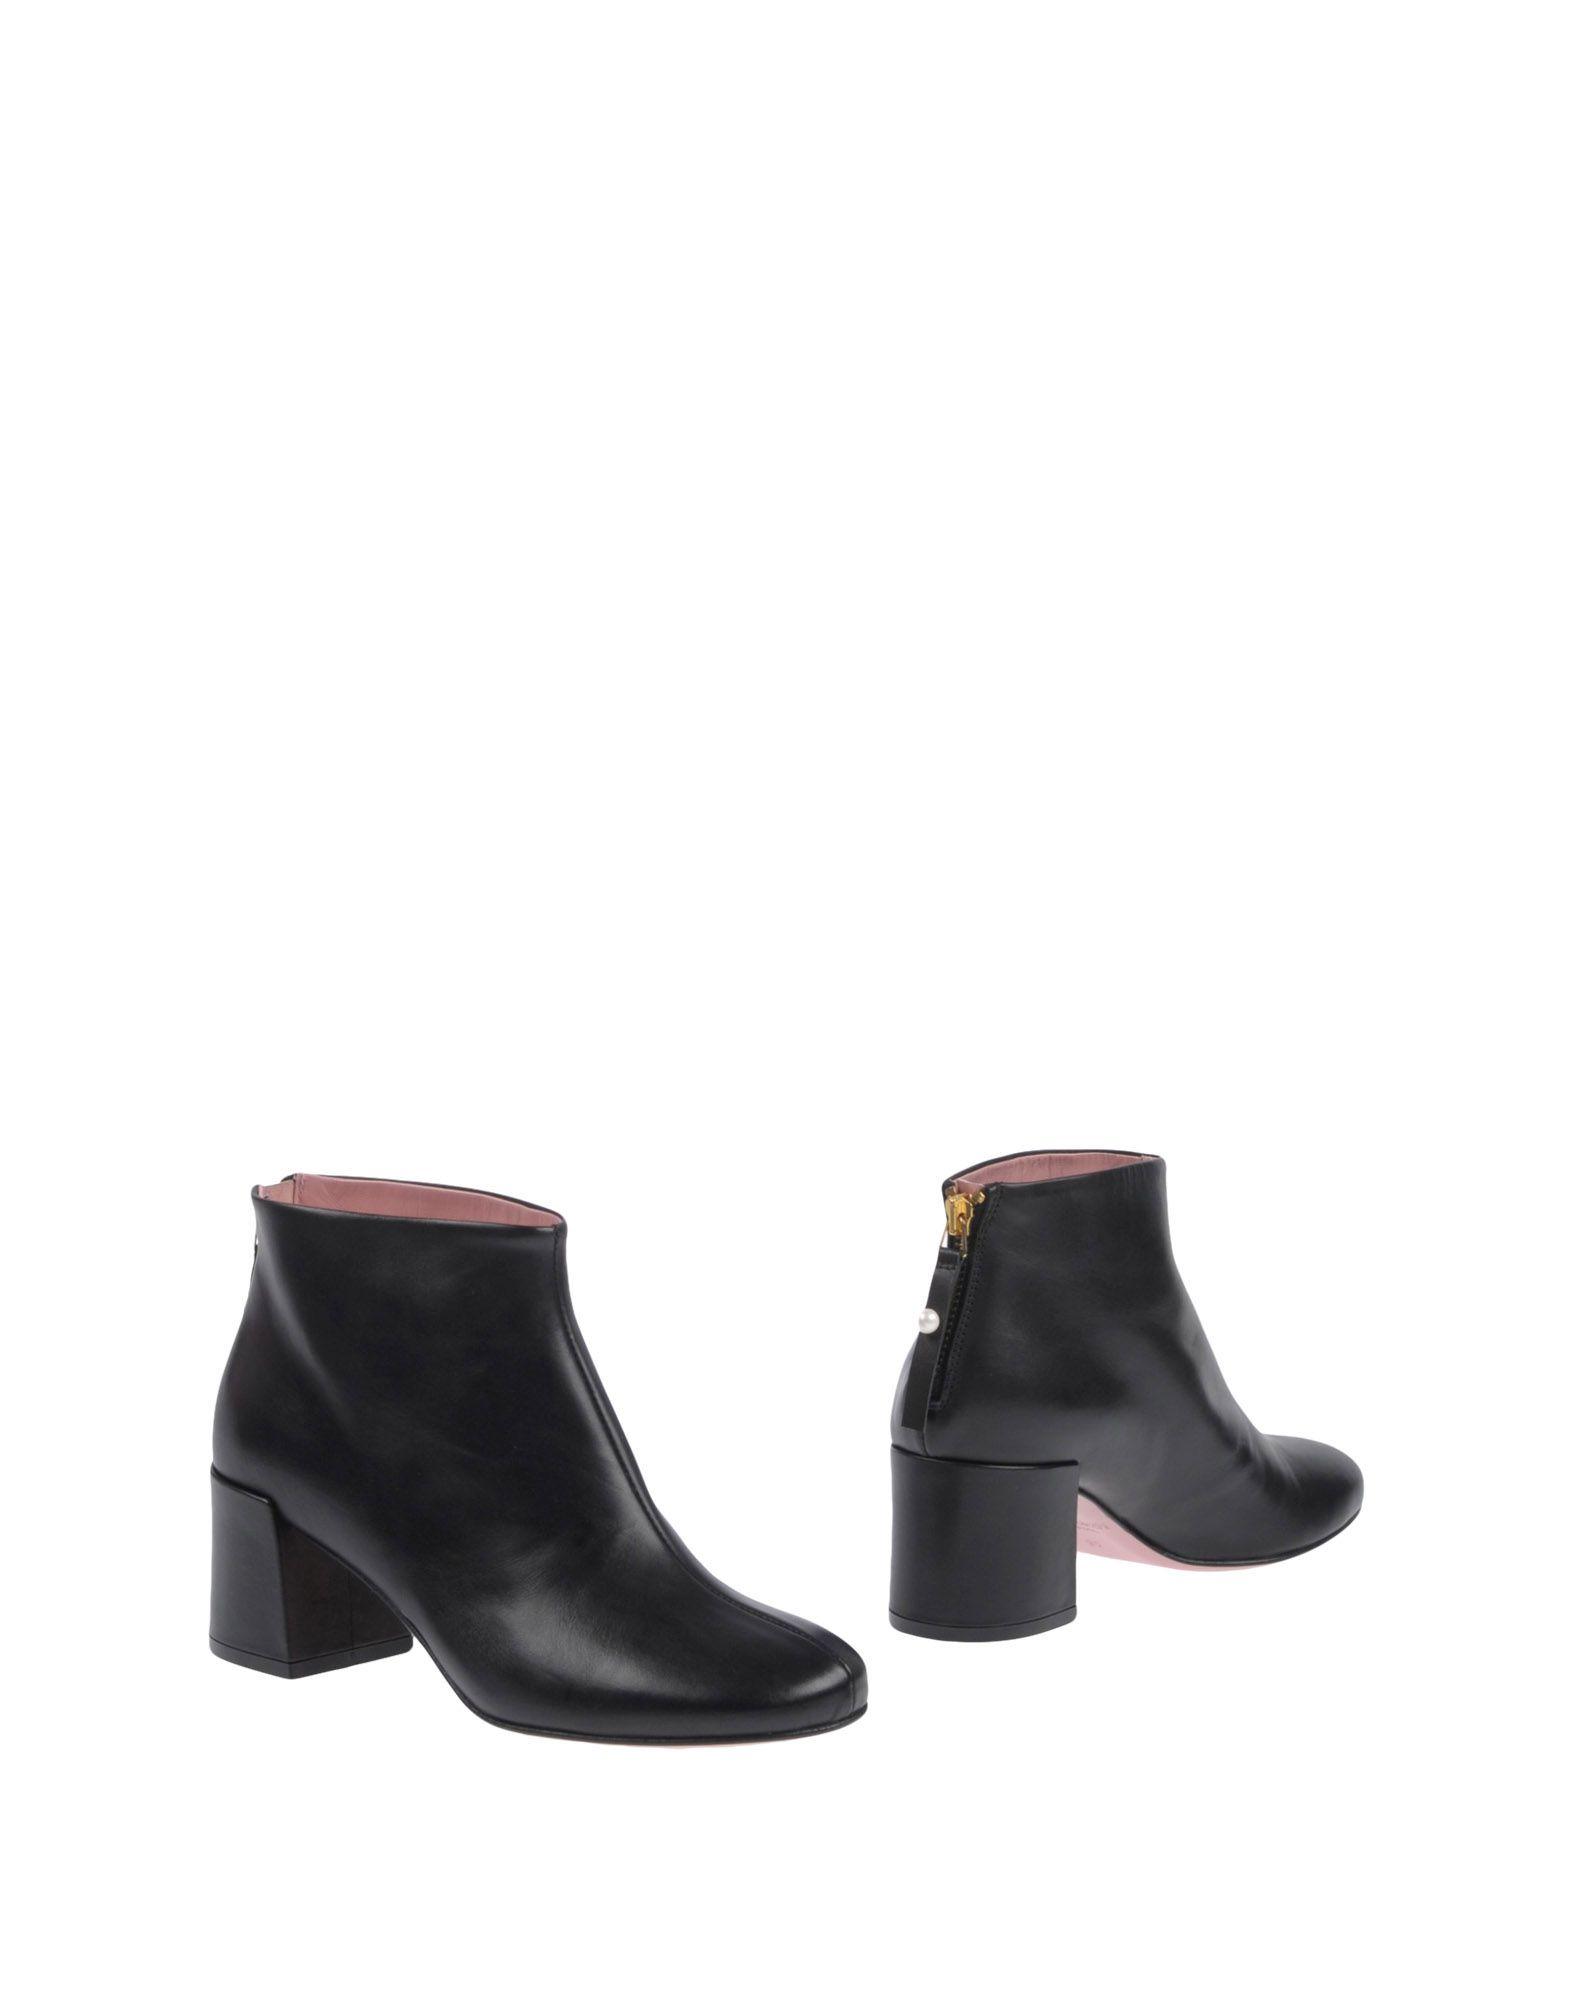 Tipe E Tacchi Stiefelette Damen  11448416QAGut aussehende strapazierfähige Schuhe